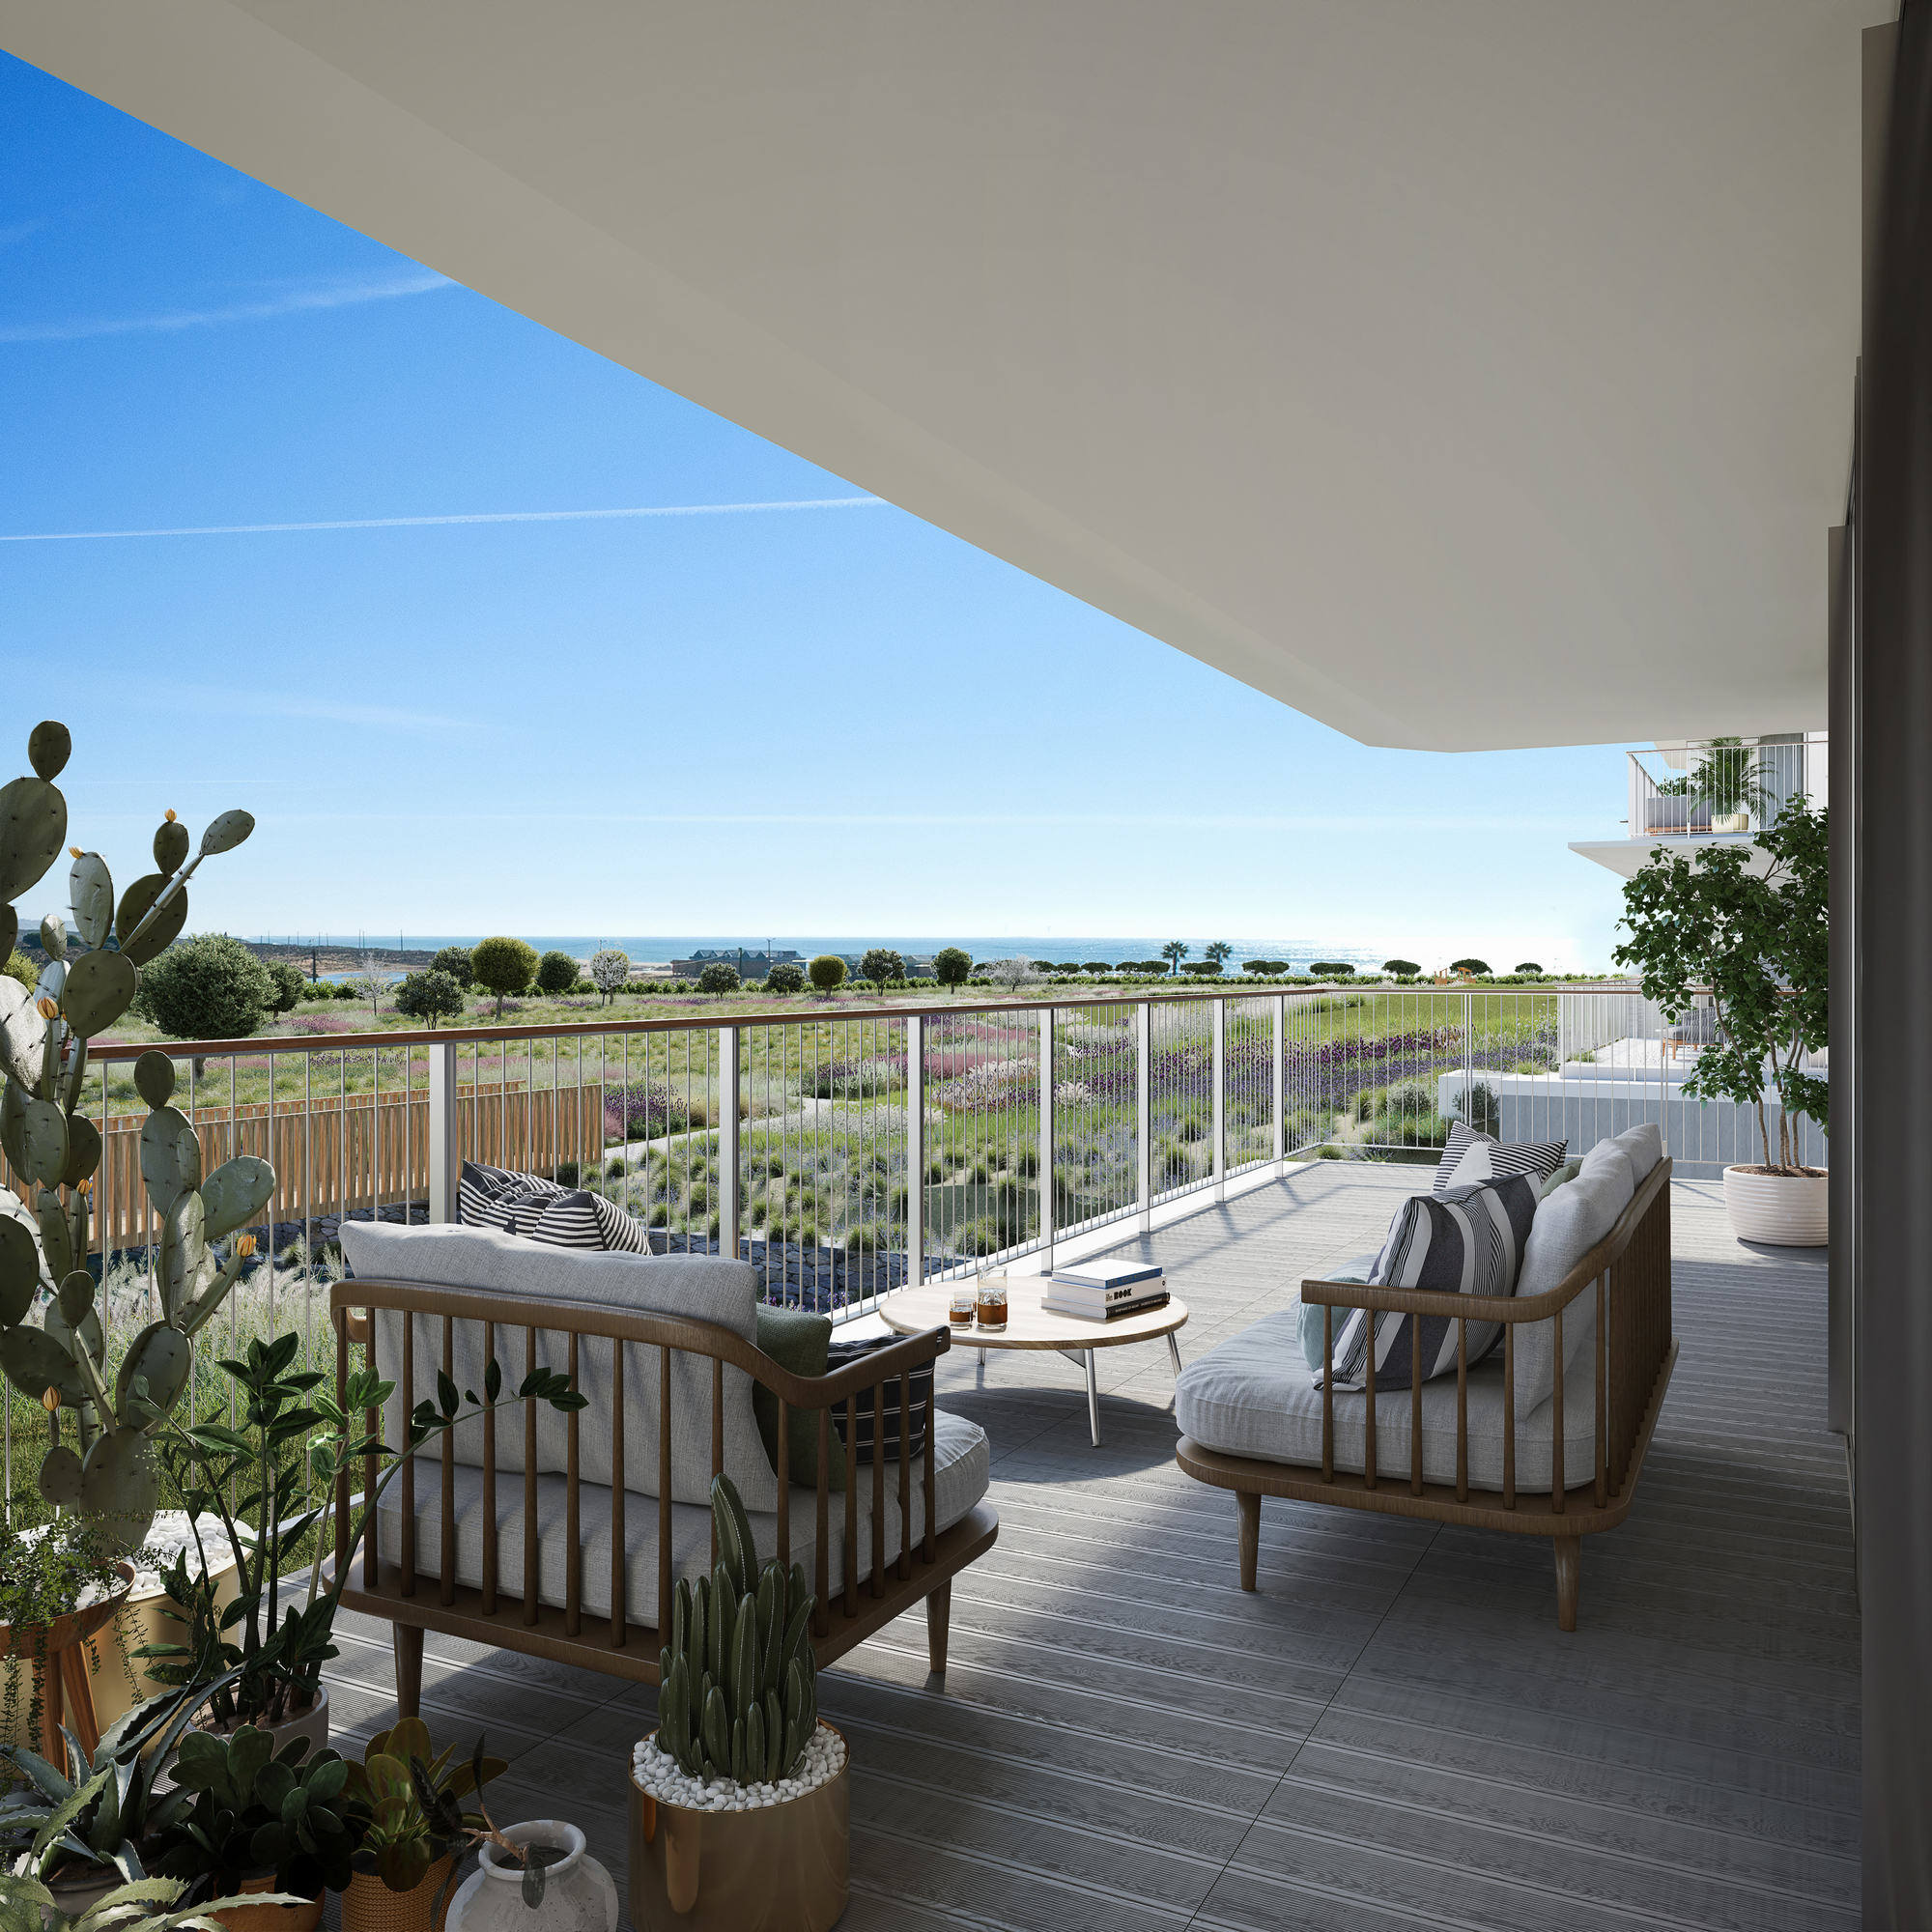 bayline-b5-p0-terrace